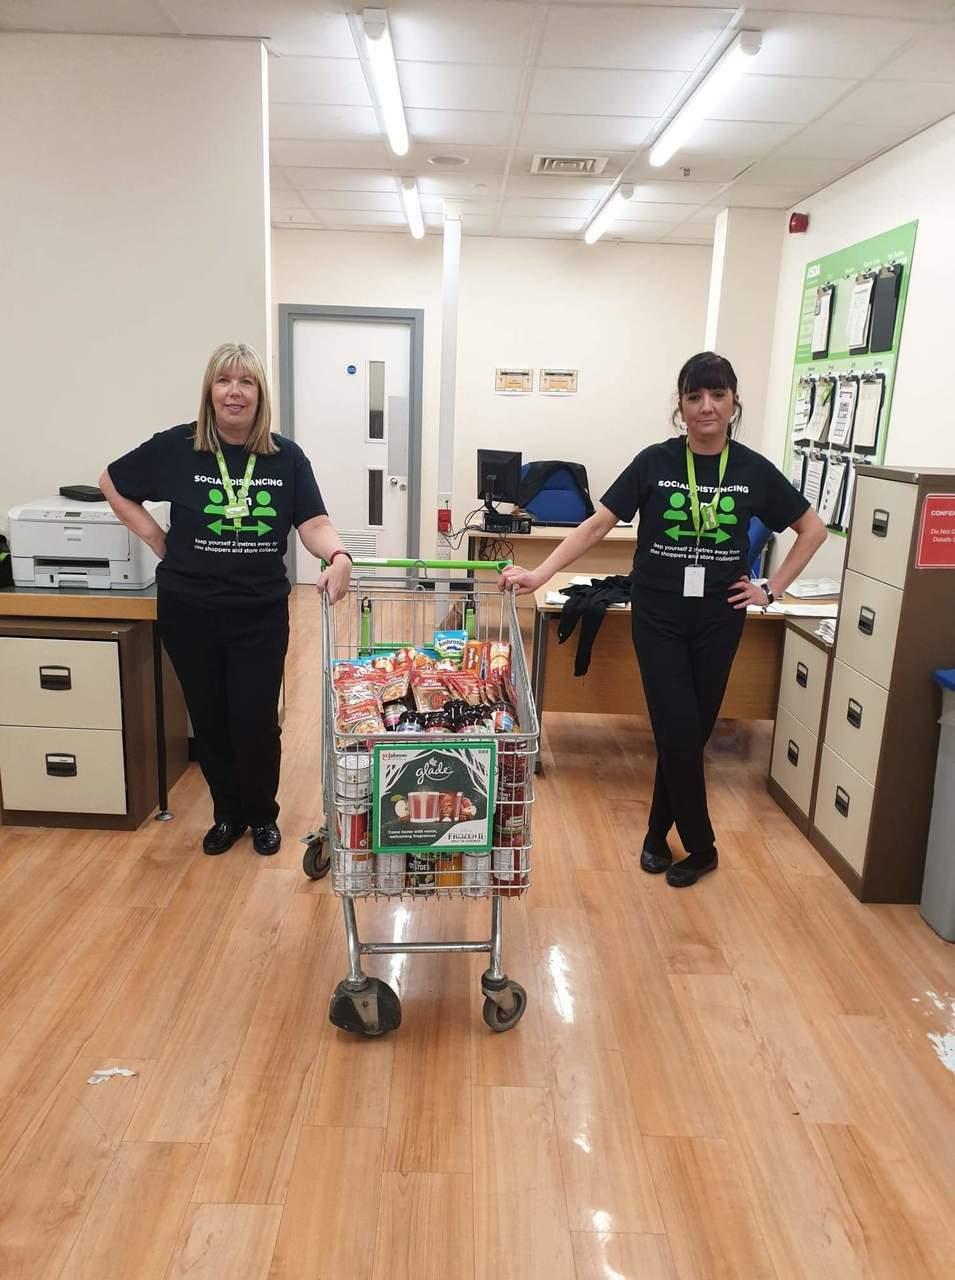 Food bank support | Asda Glasshoughton